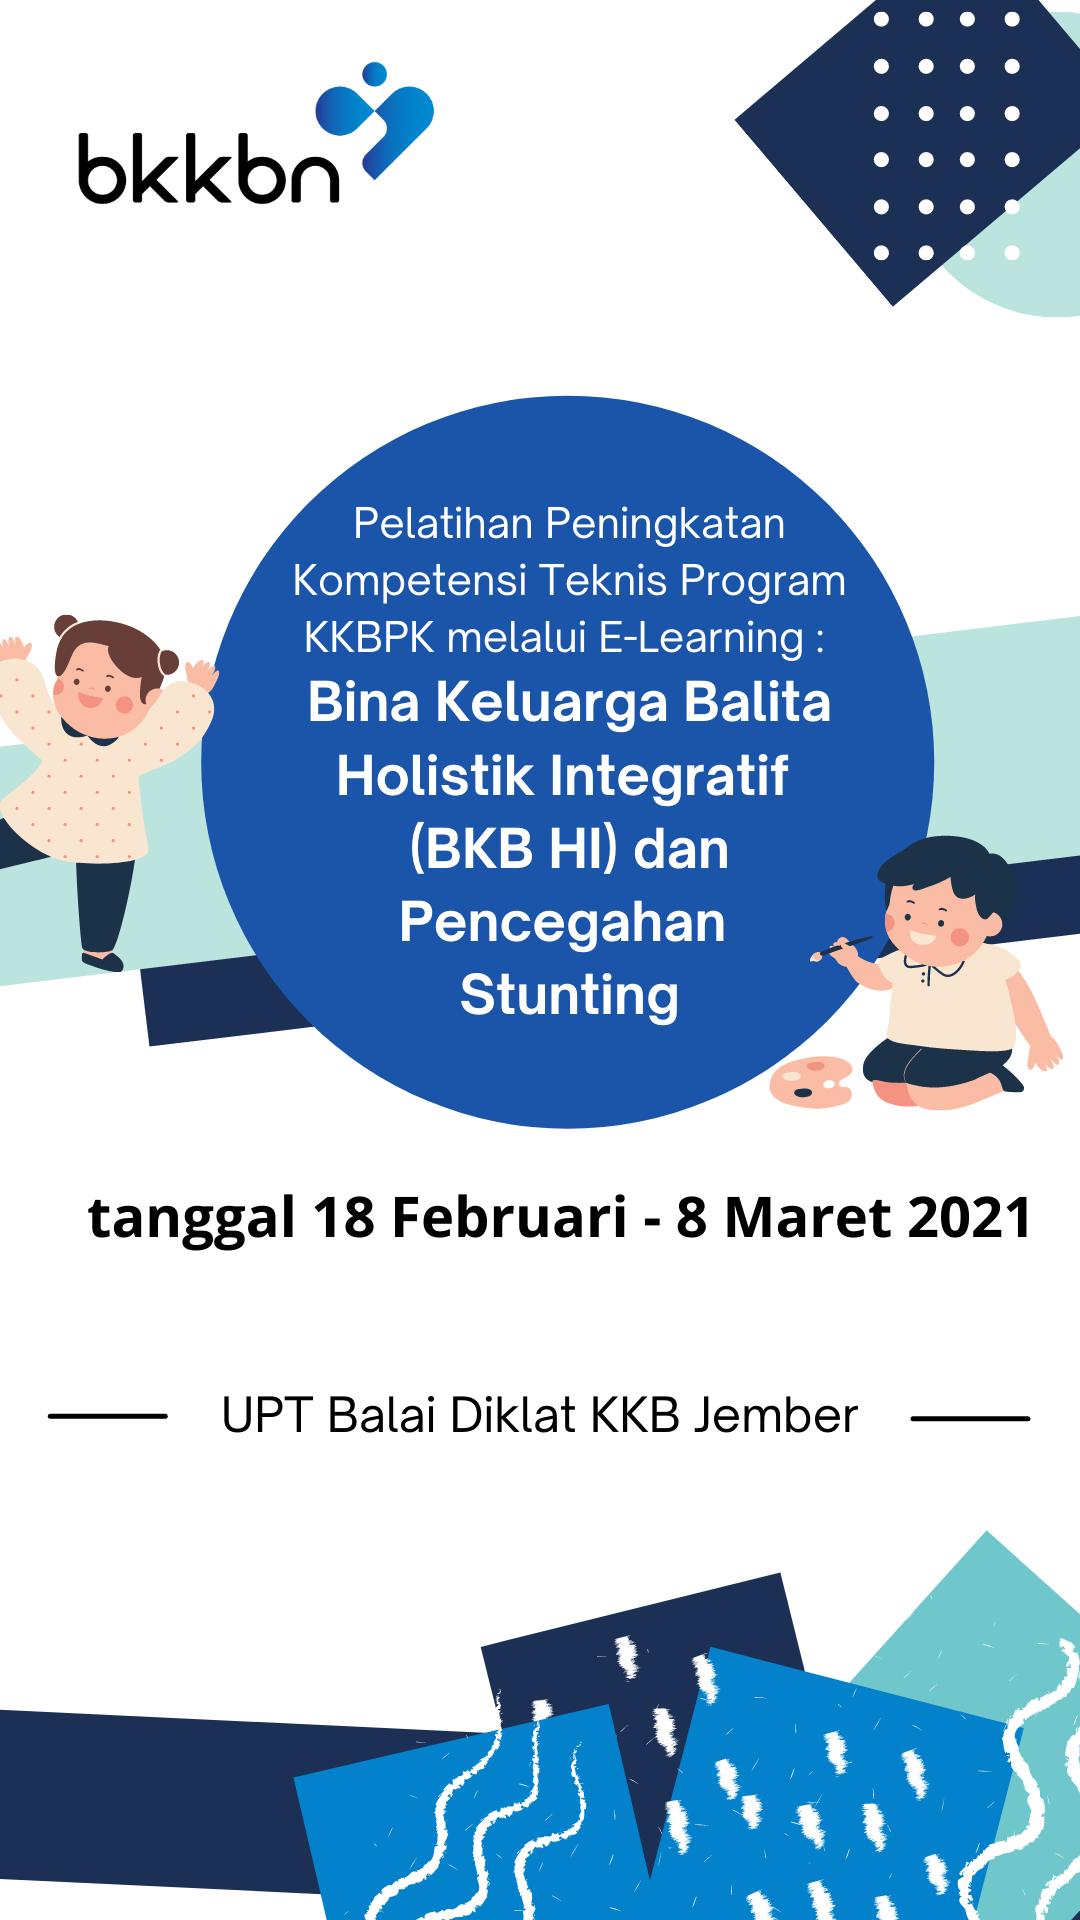 Pelatihan Peningkatan Kompetensi Teknis Program KKBPK melalui E-Learning :  Bina Keluarga Balita Holistik Integratif  (BKB HI)  dan Pencegahan Stunting